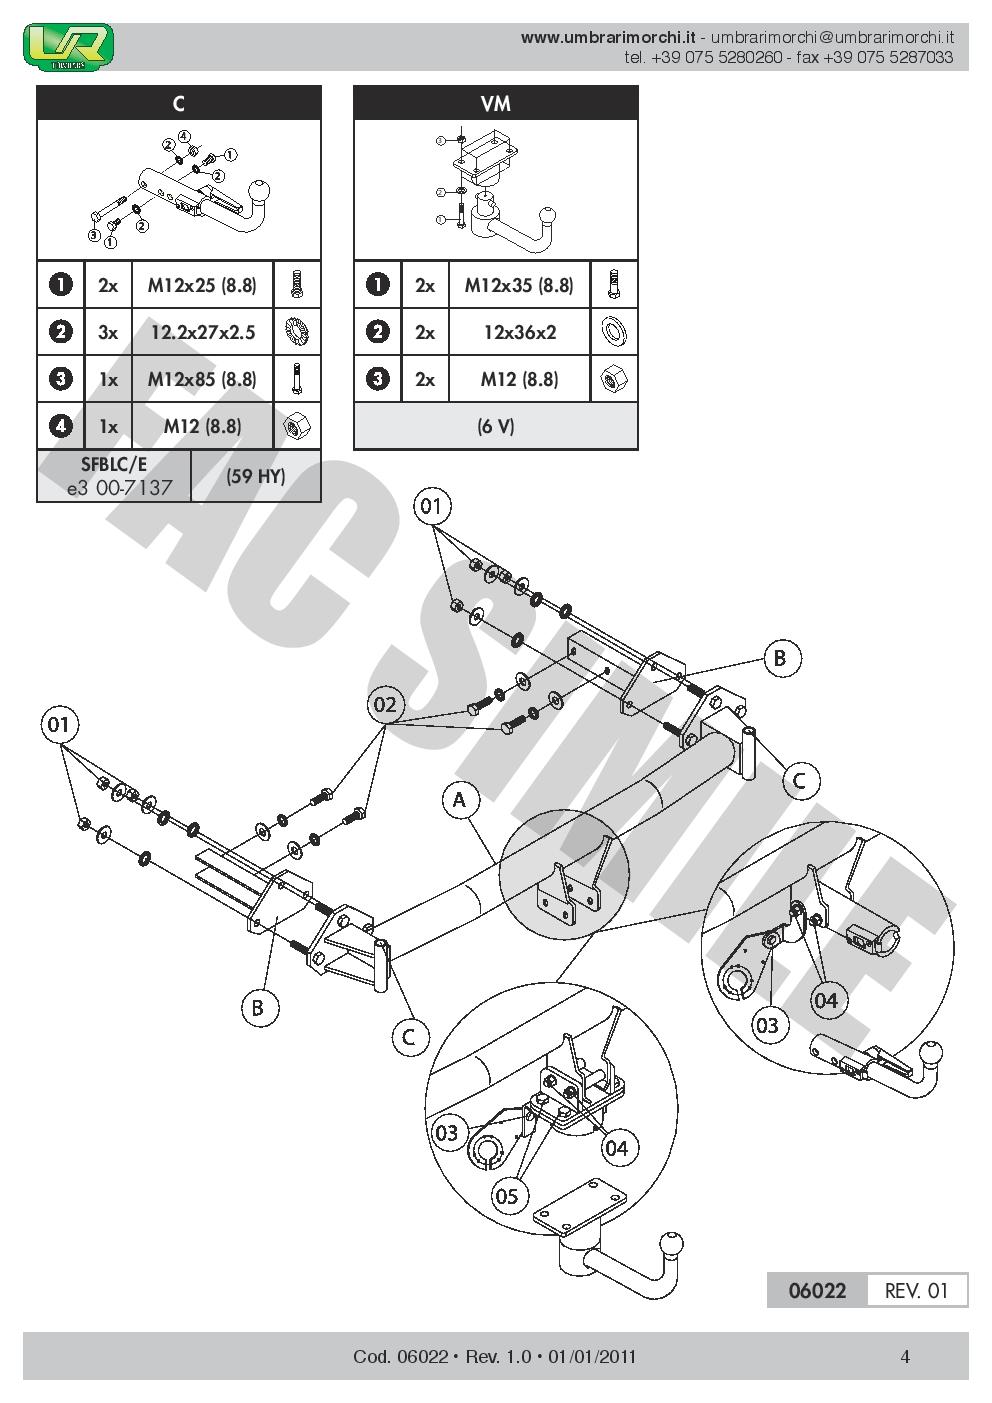 AHK Abnehmbare Anhängerkupplung BMW 3 Series Compact 2001-2005 06022//C/_B1